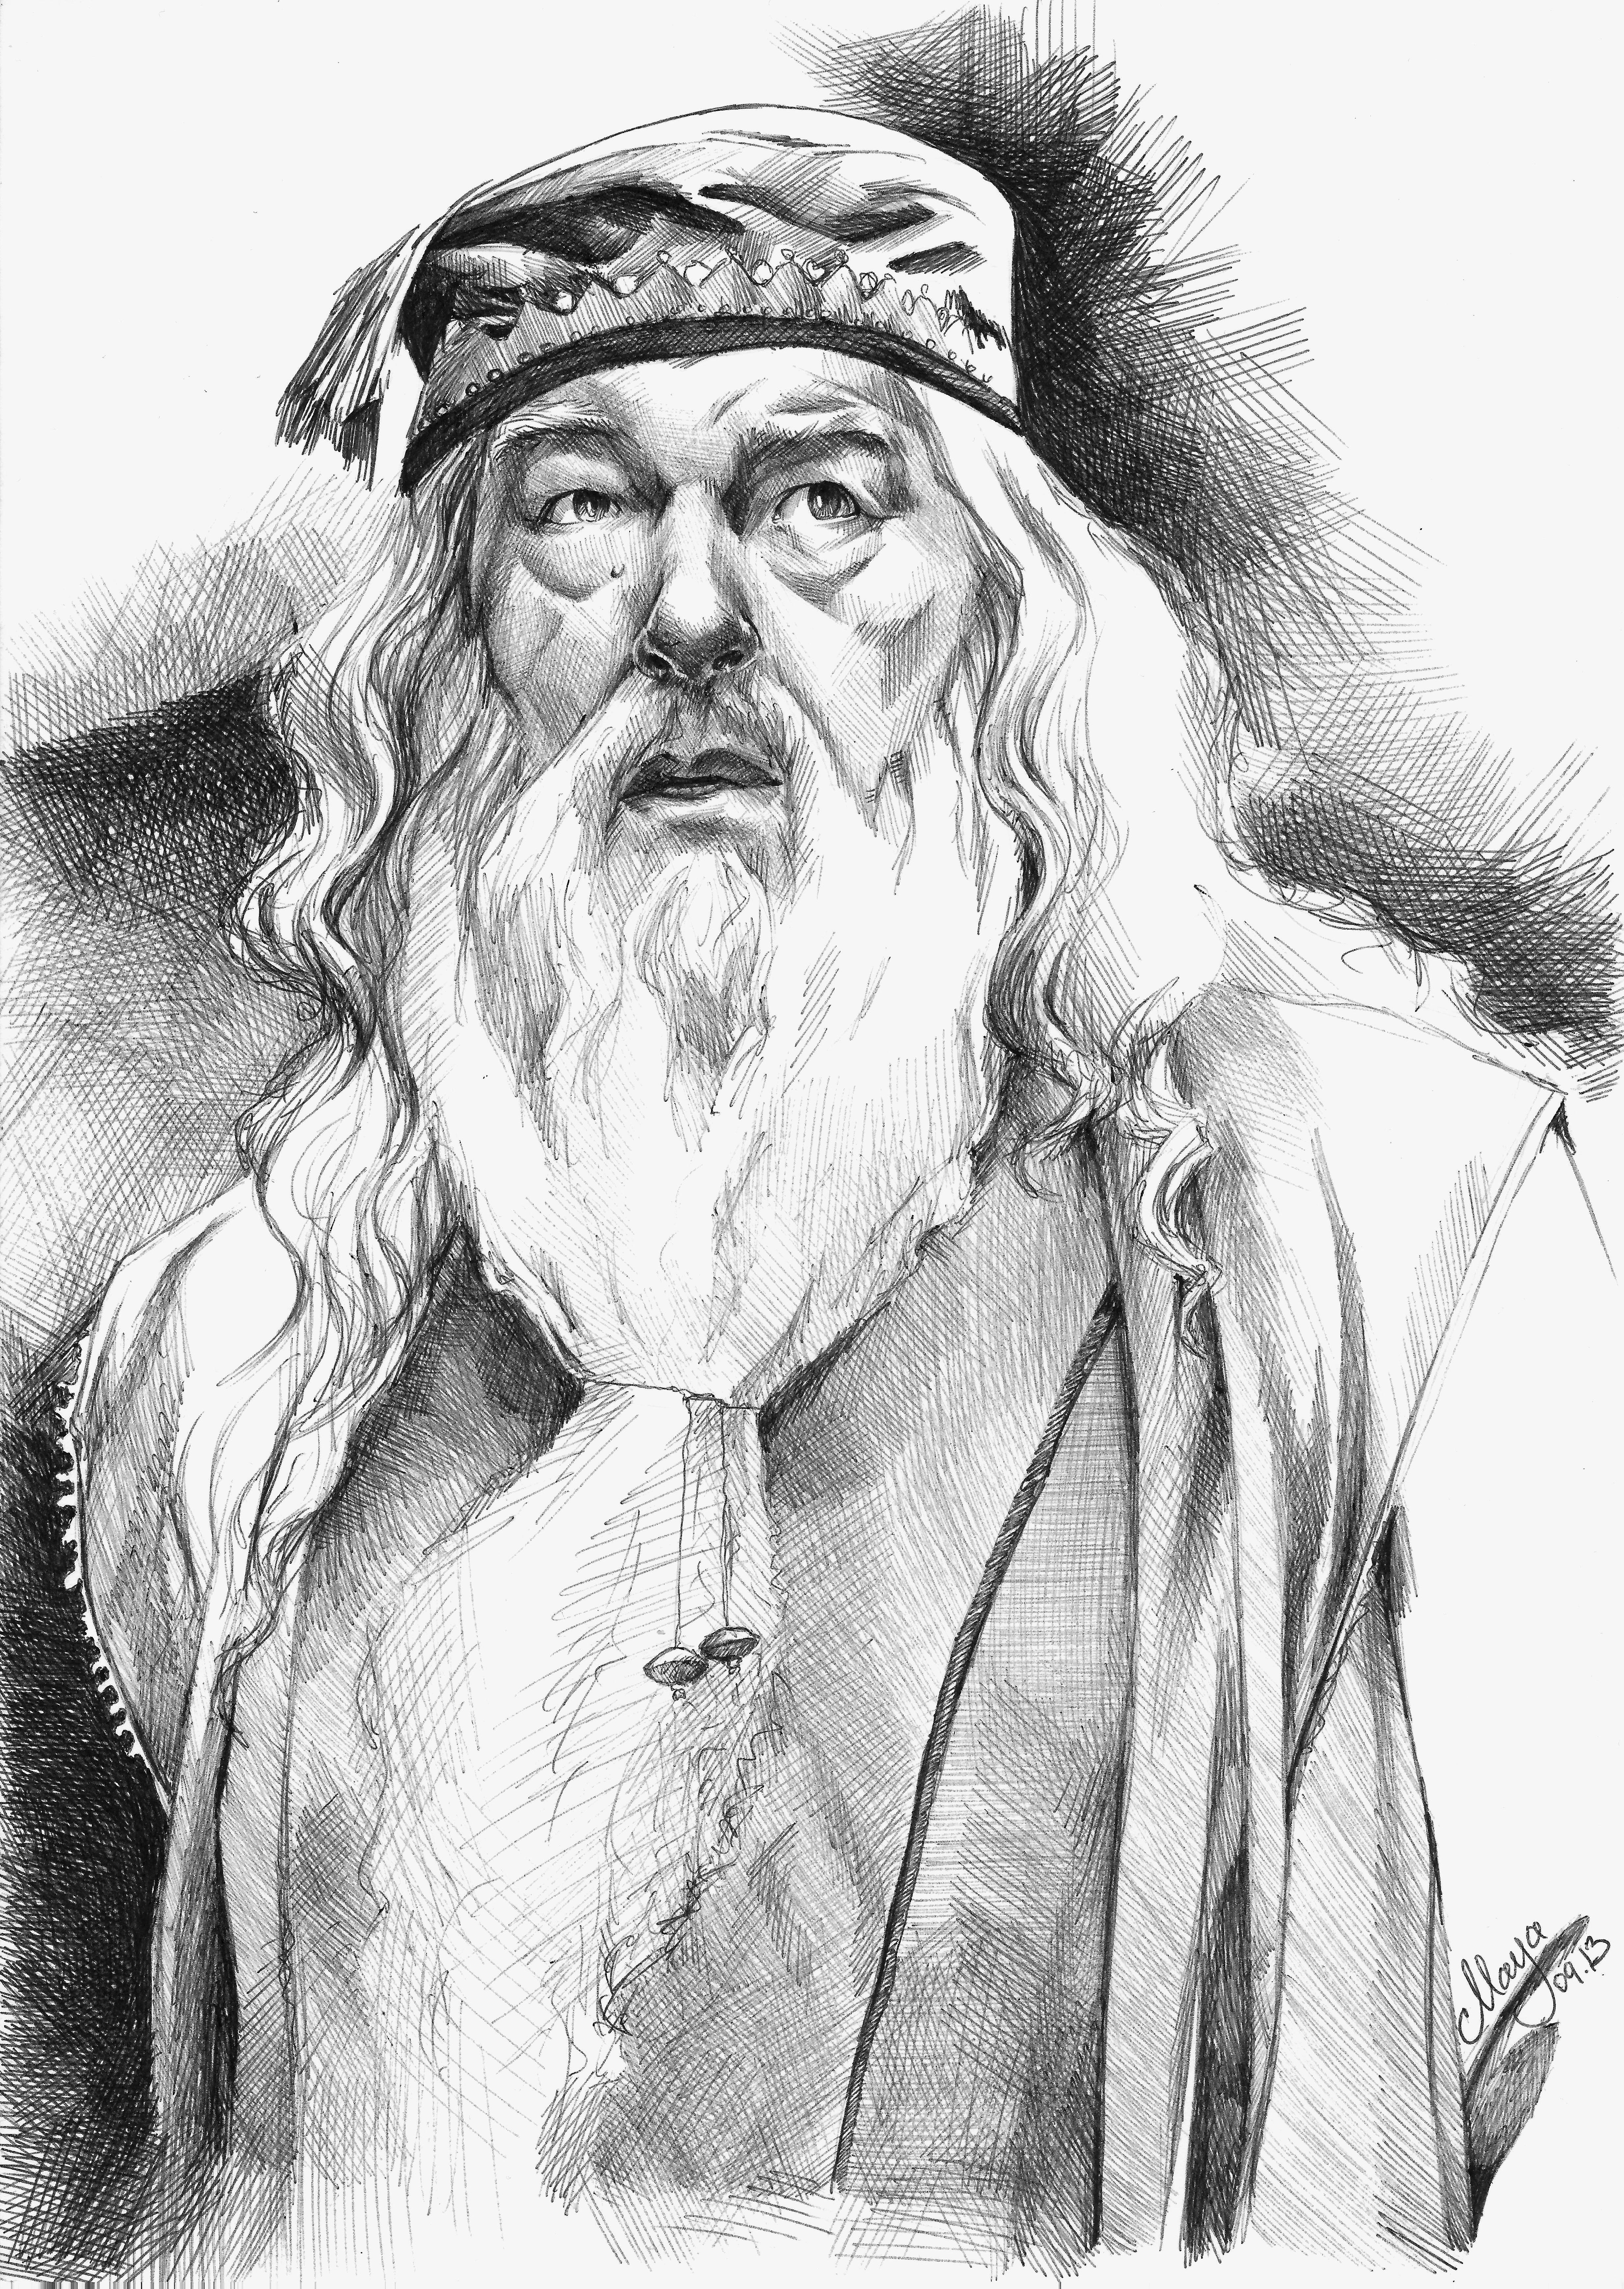 Albus Percival Wulfric Brian Dumbledore By Maya Notliketheotherdeviantart On DeviantART